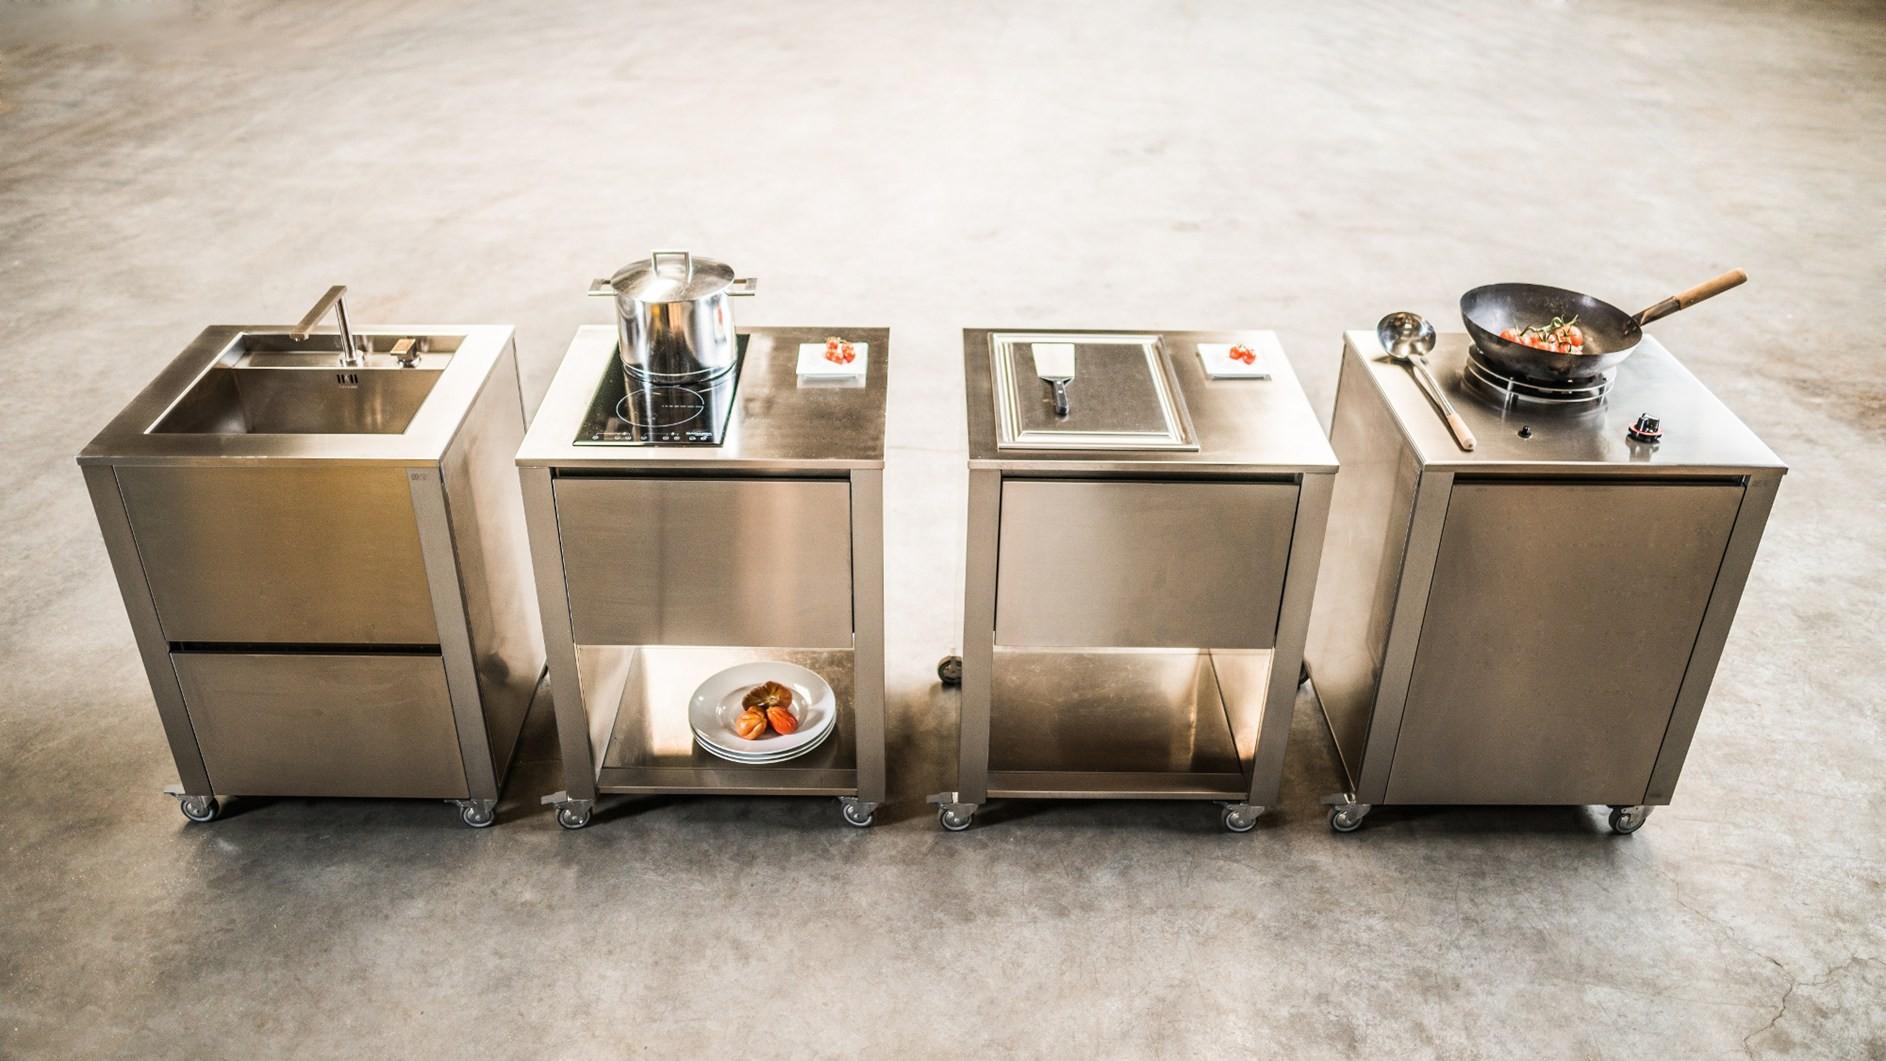 Cucine modulari perch sceglierle brescia news for Cucine modulari